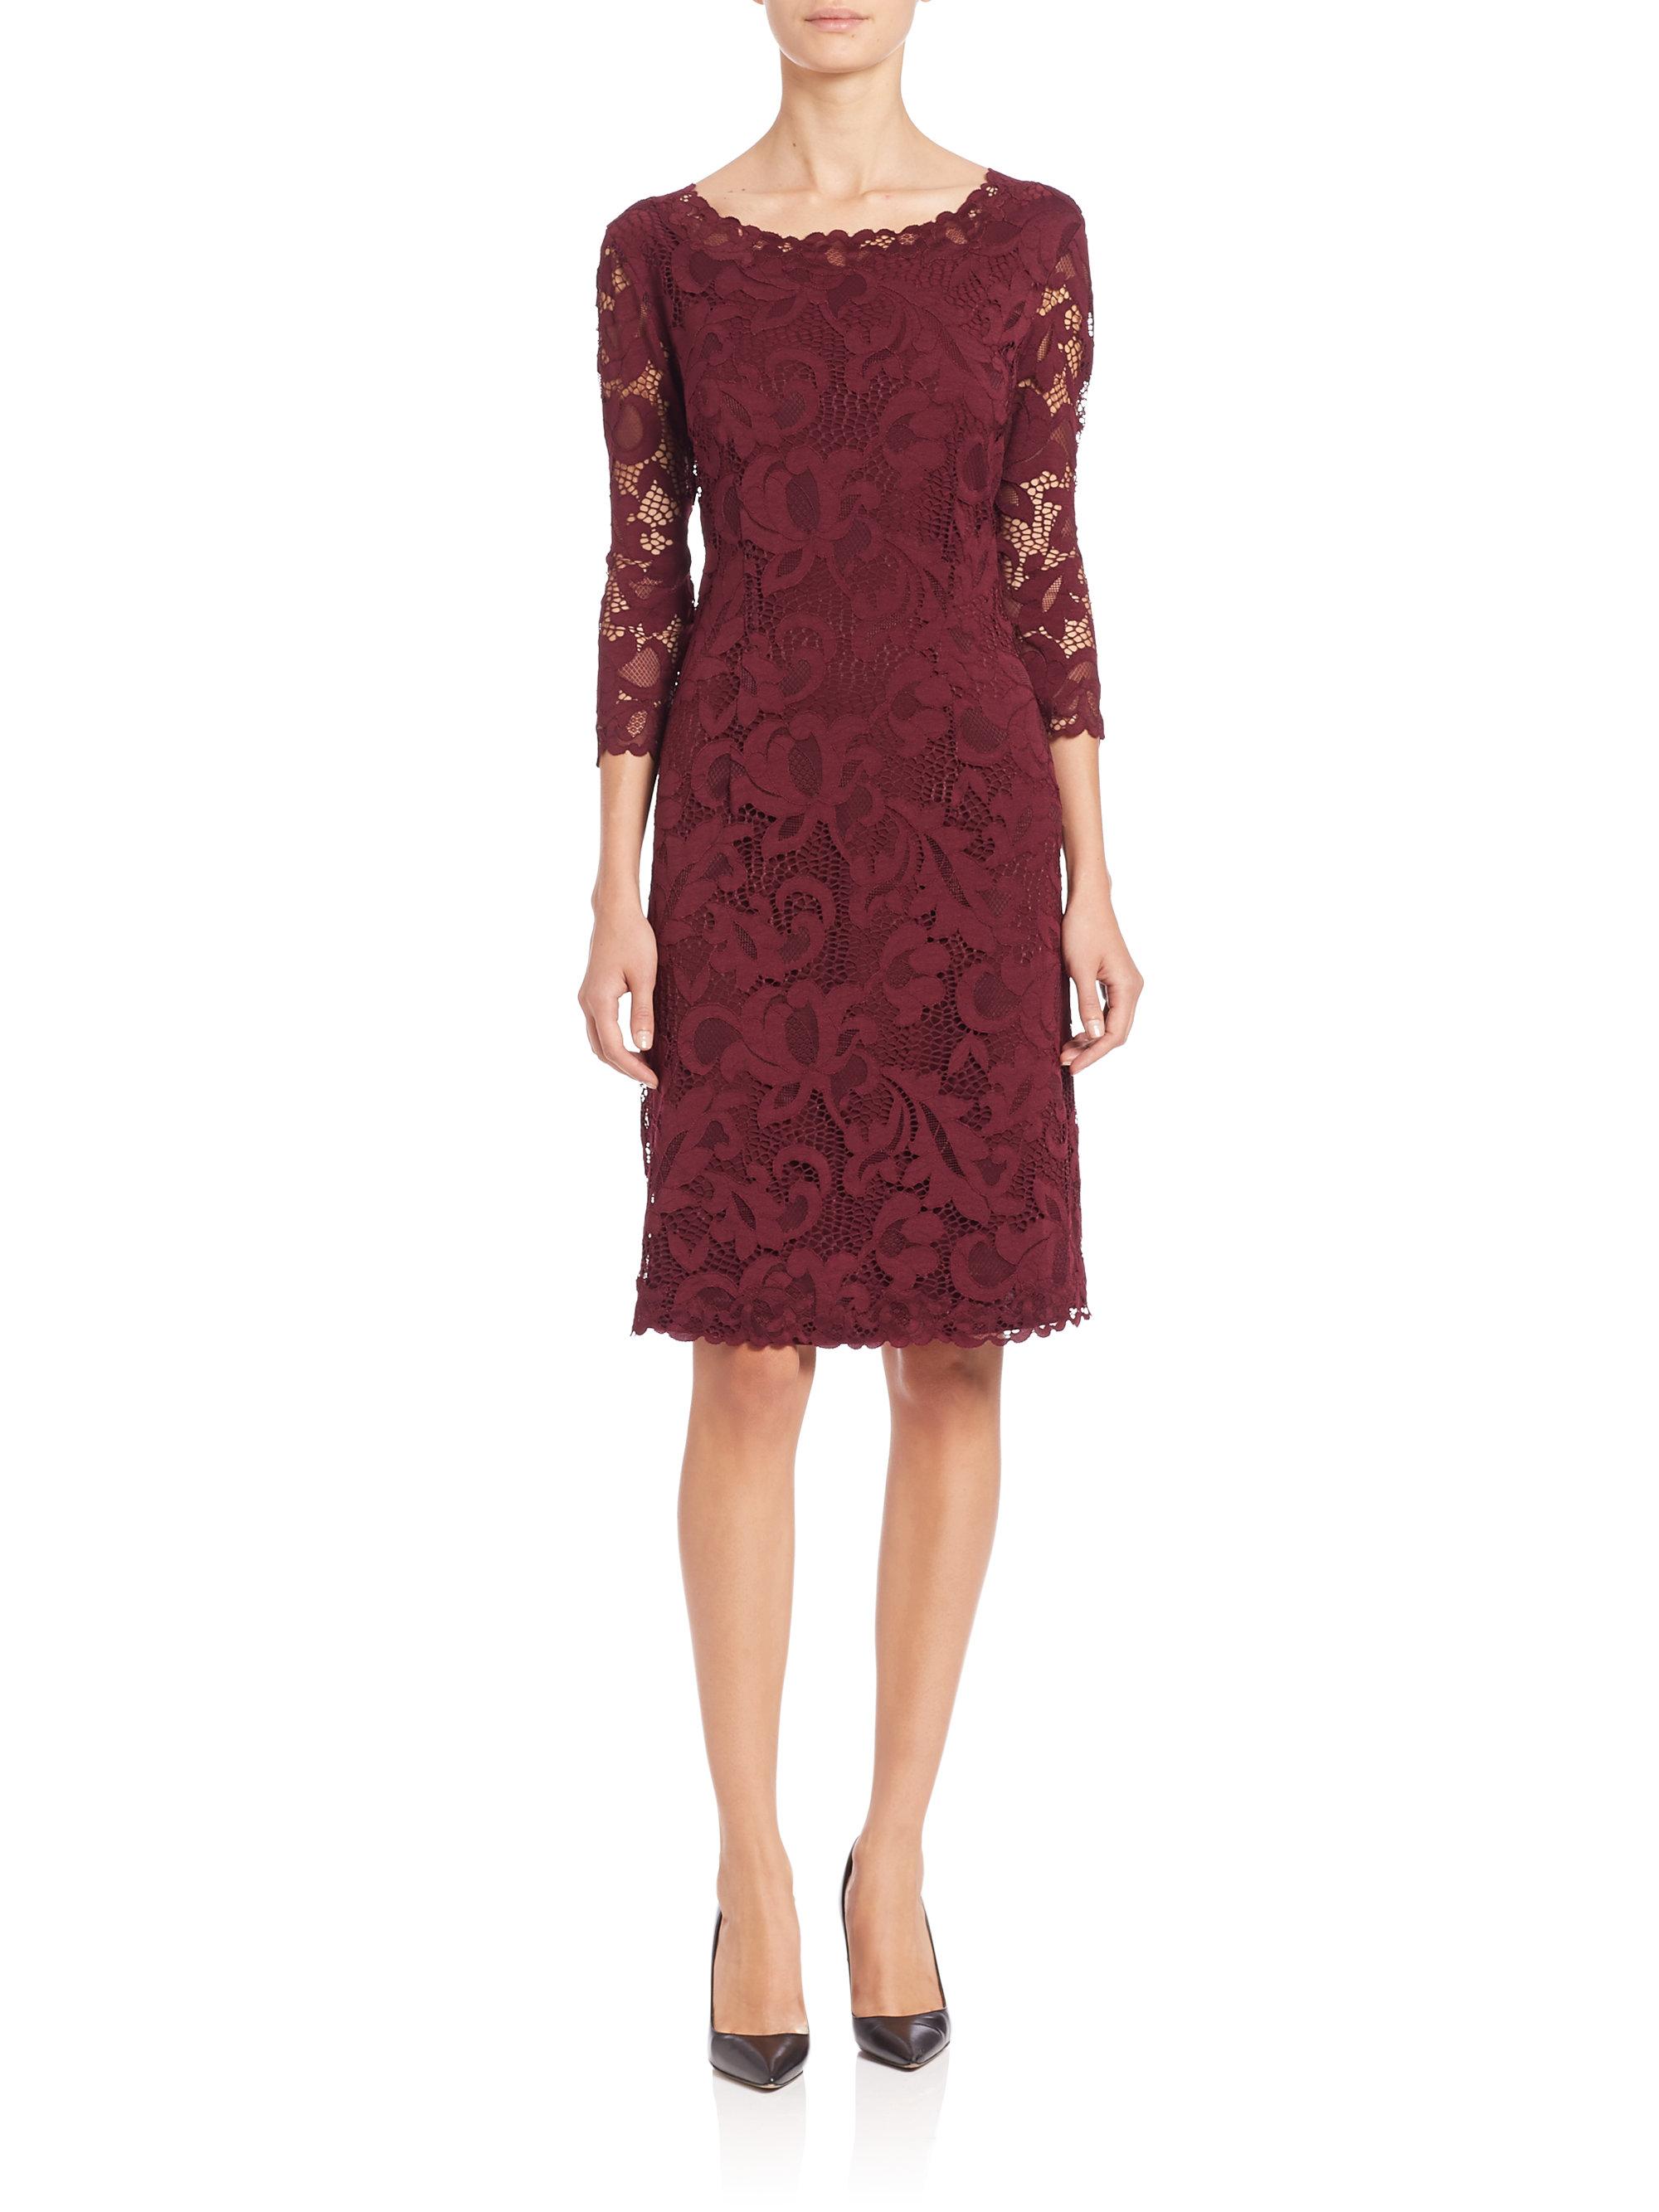 Josie Natori Three Quarter Sleeve Lace Dress In Purple